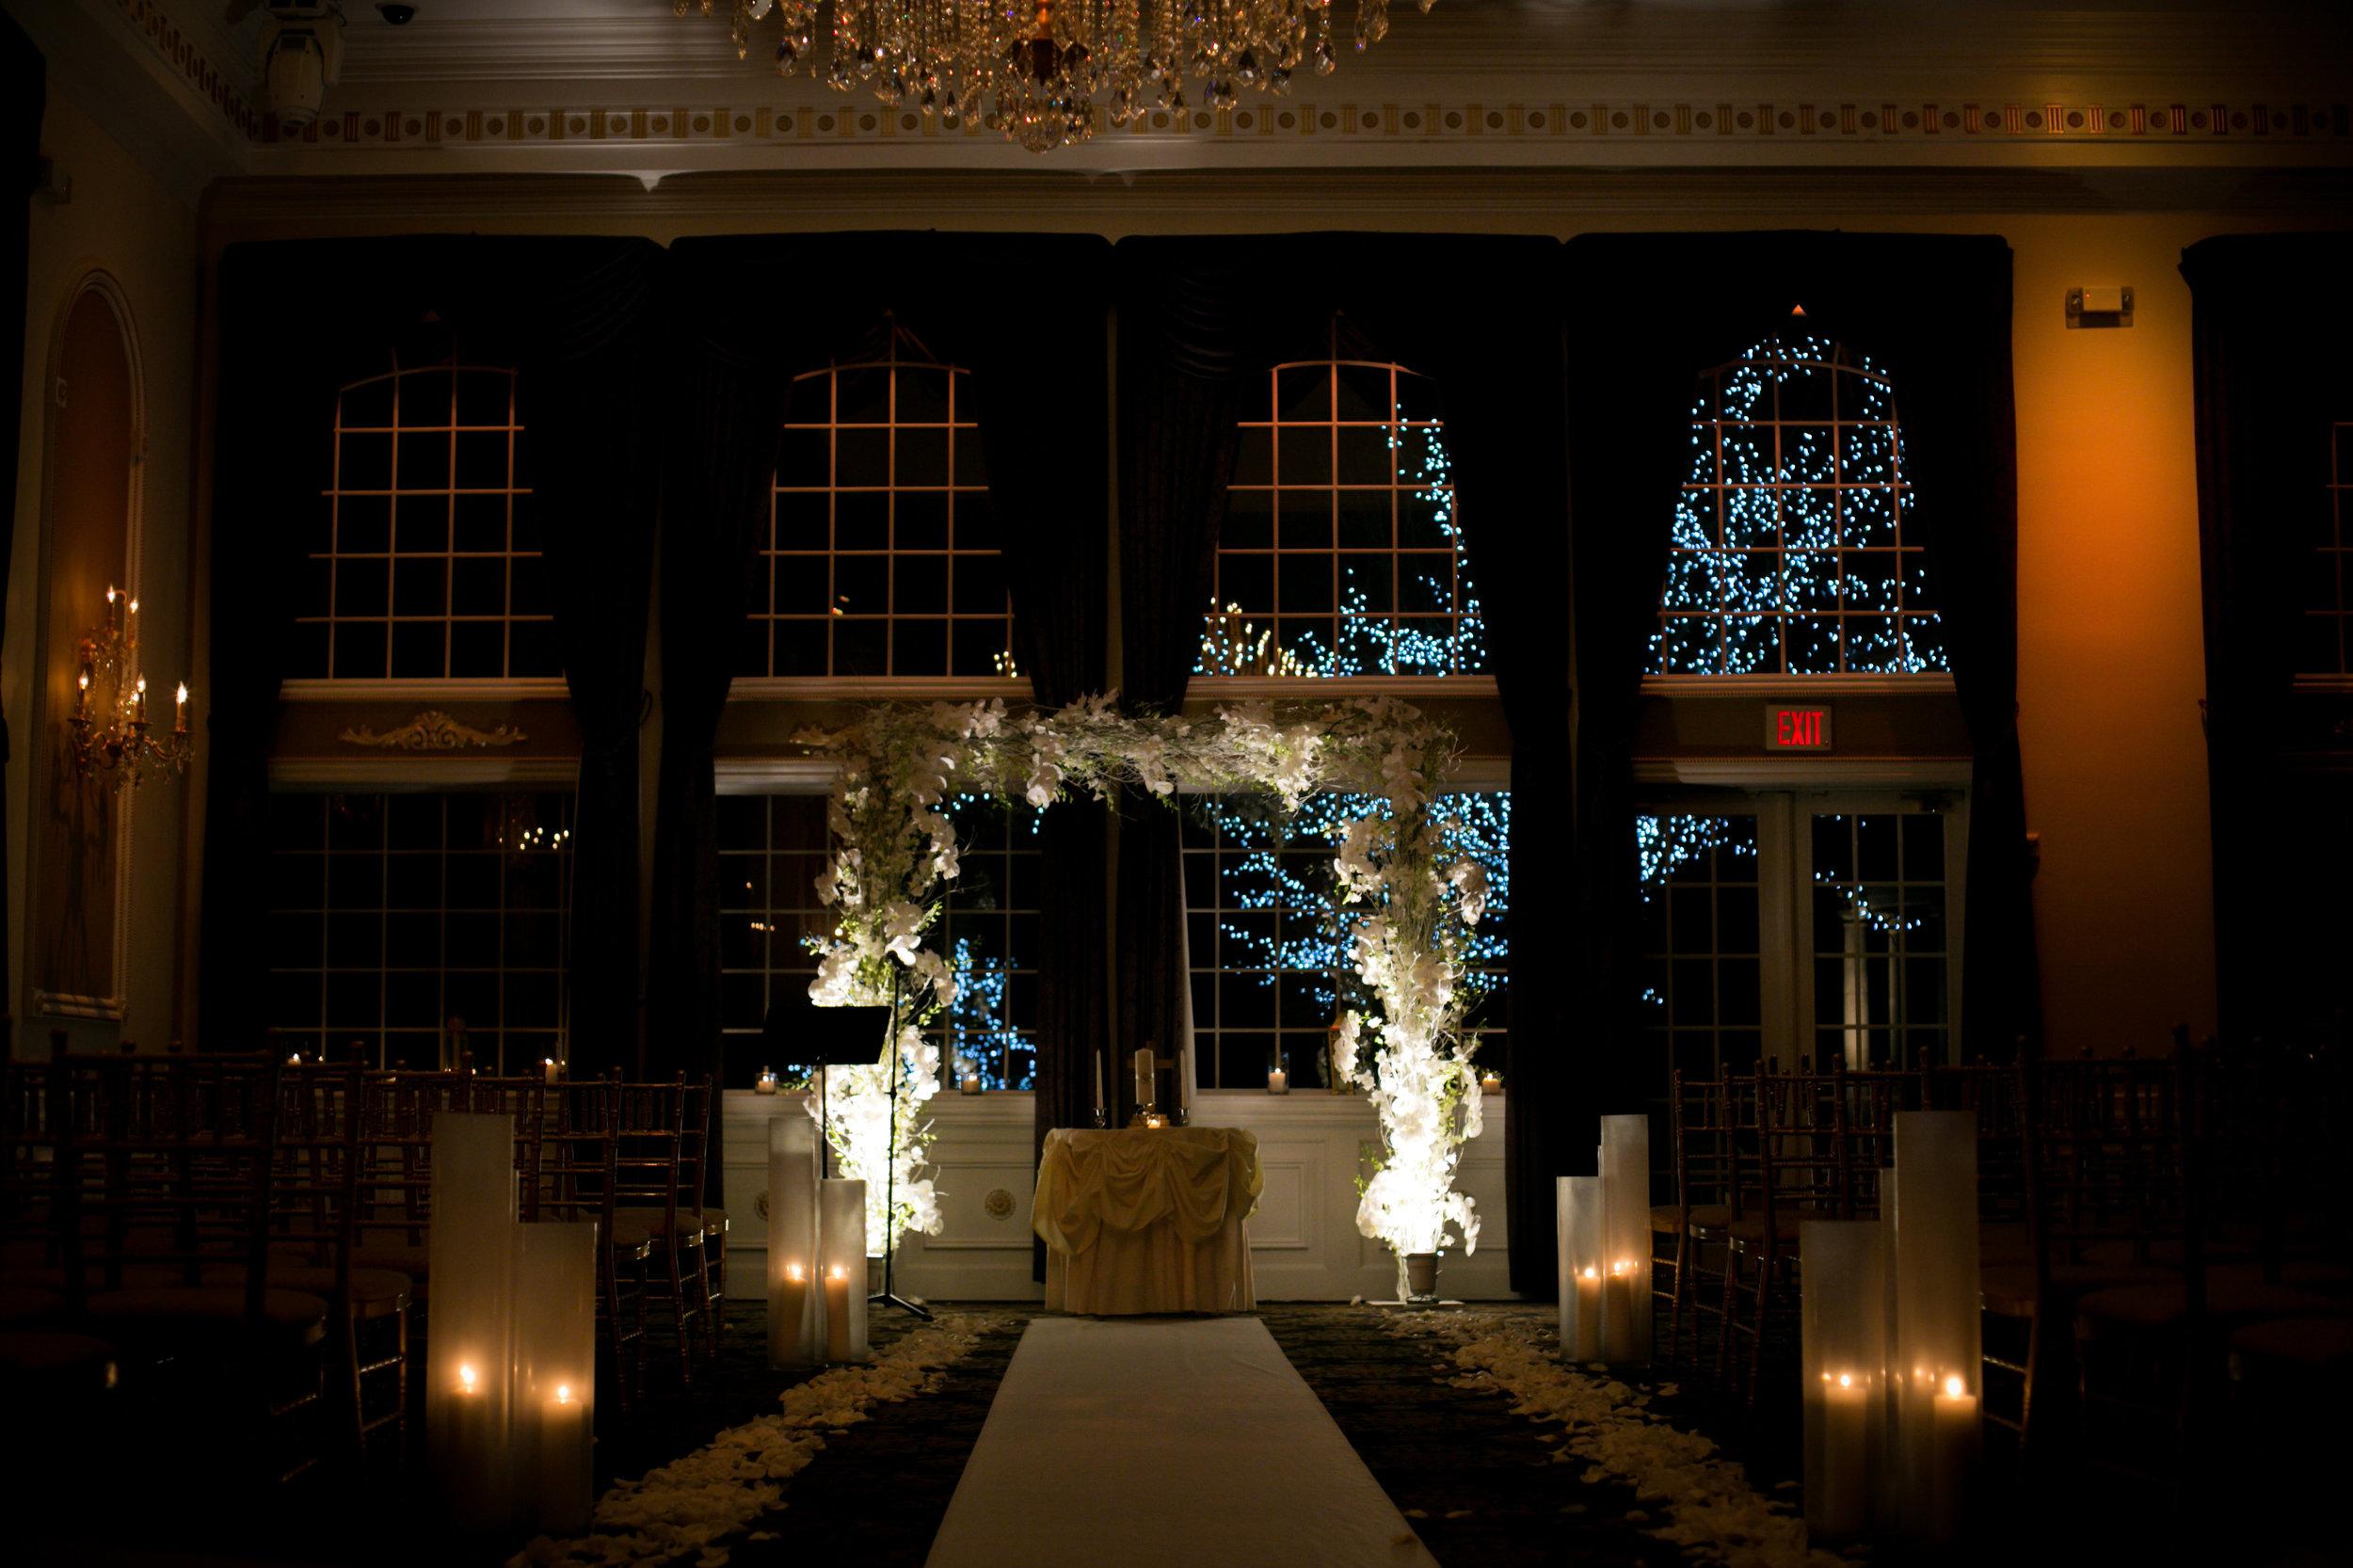 Ceci_New_York_Custom_Invitation_ New_Jersey_Wedding_Luxury_Personalized_Ceci_Style_Bride_Foil_Stamping42.jpg